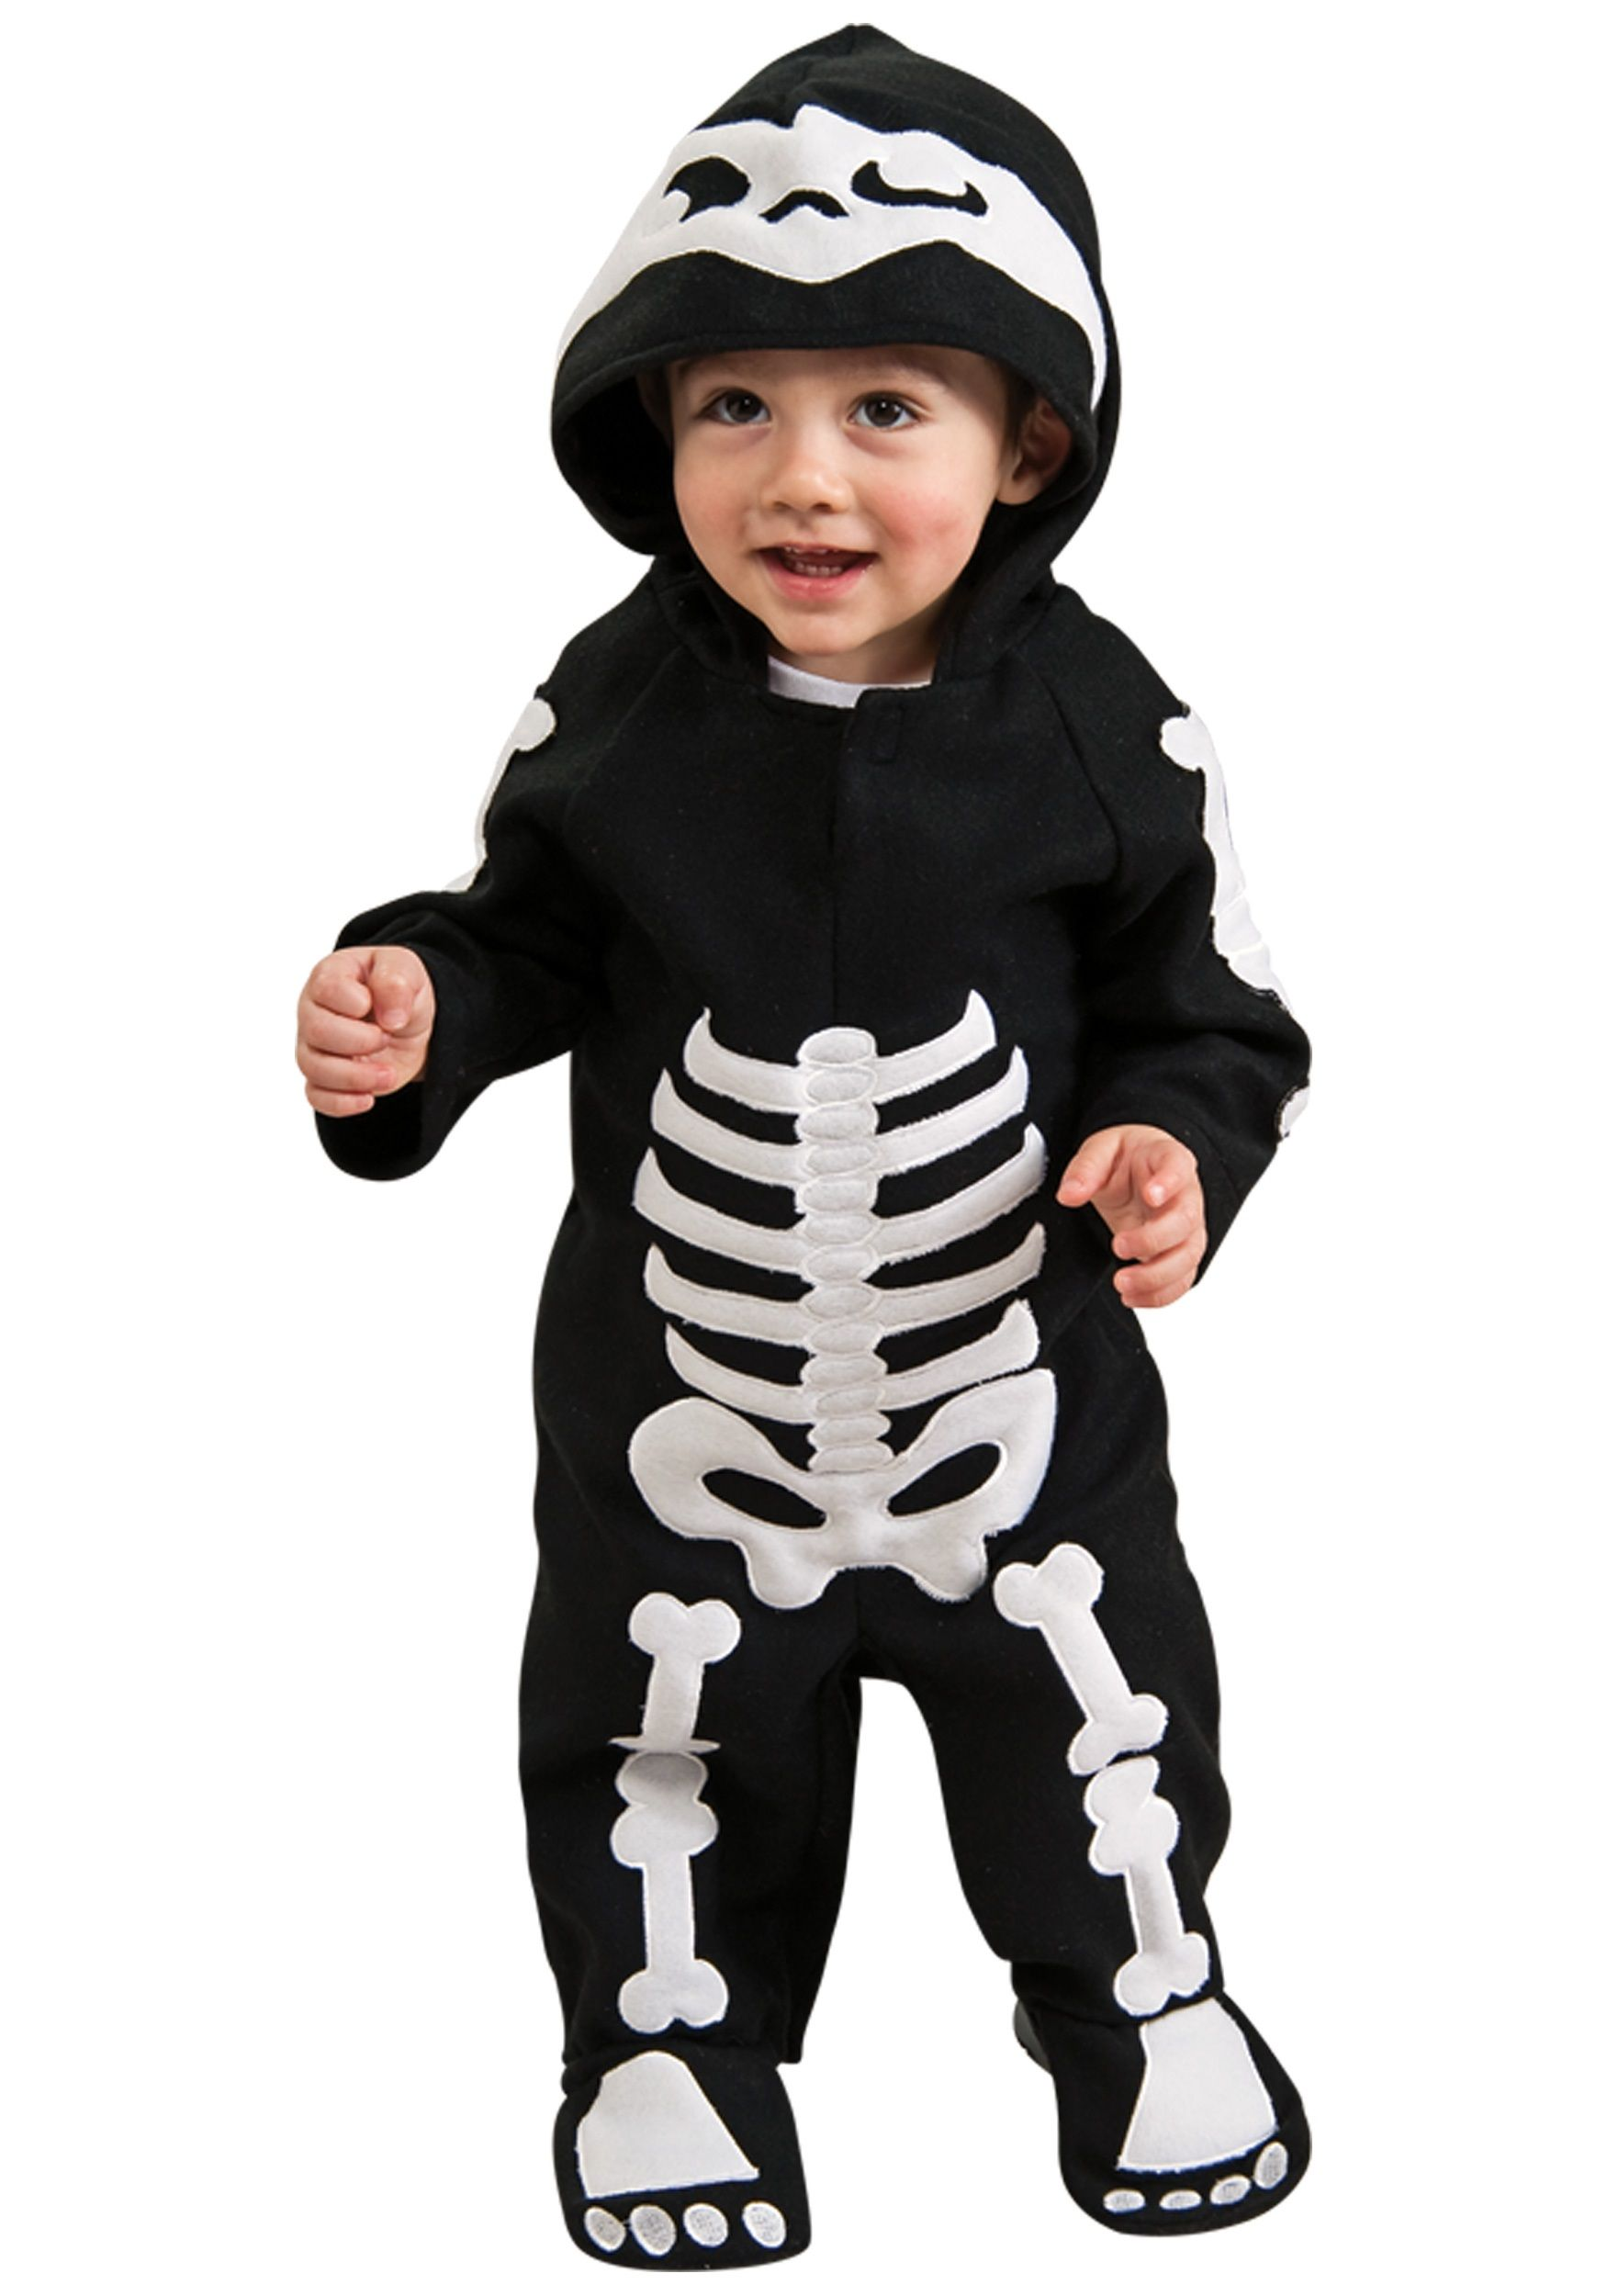 Scary Skeleton Toddler Halloween Costume